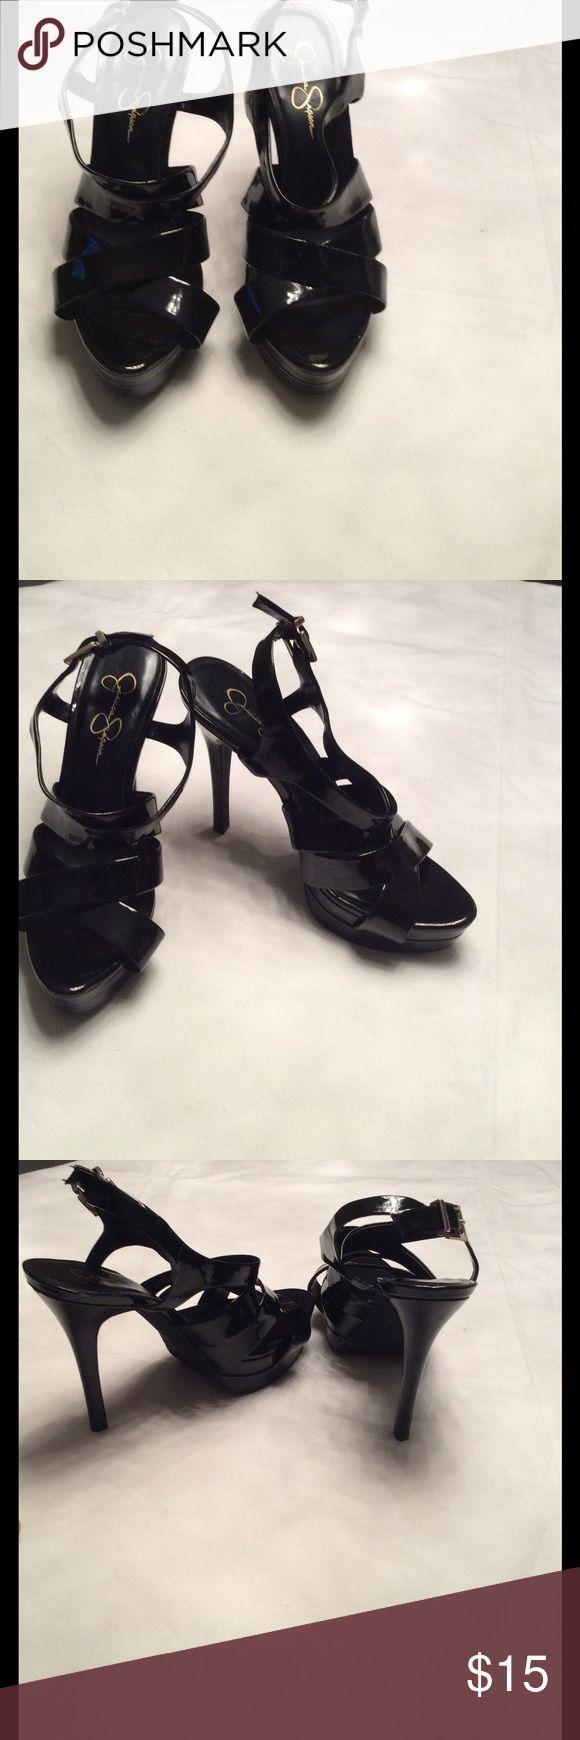 Black patent high heel Back patent high heel. 5 inch heel. Size 10B Jessica Simpson Shoes Heels